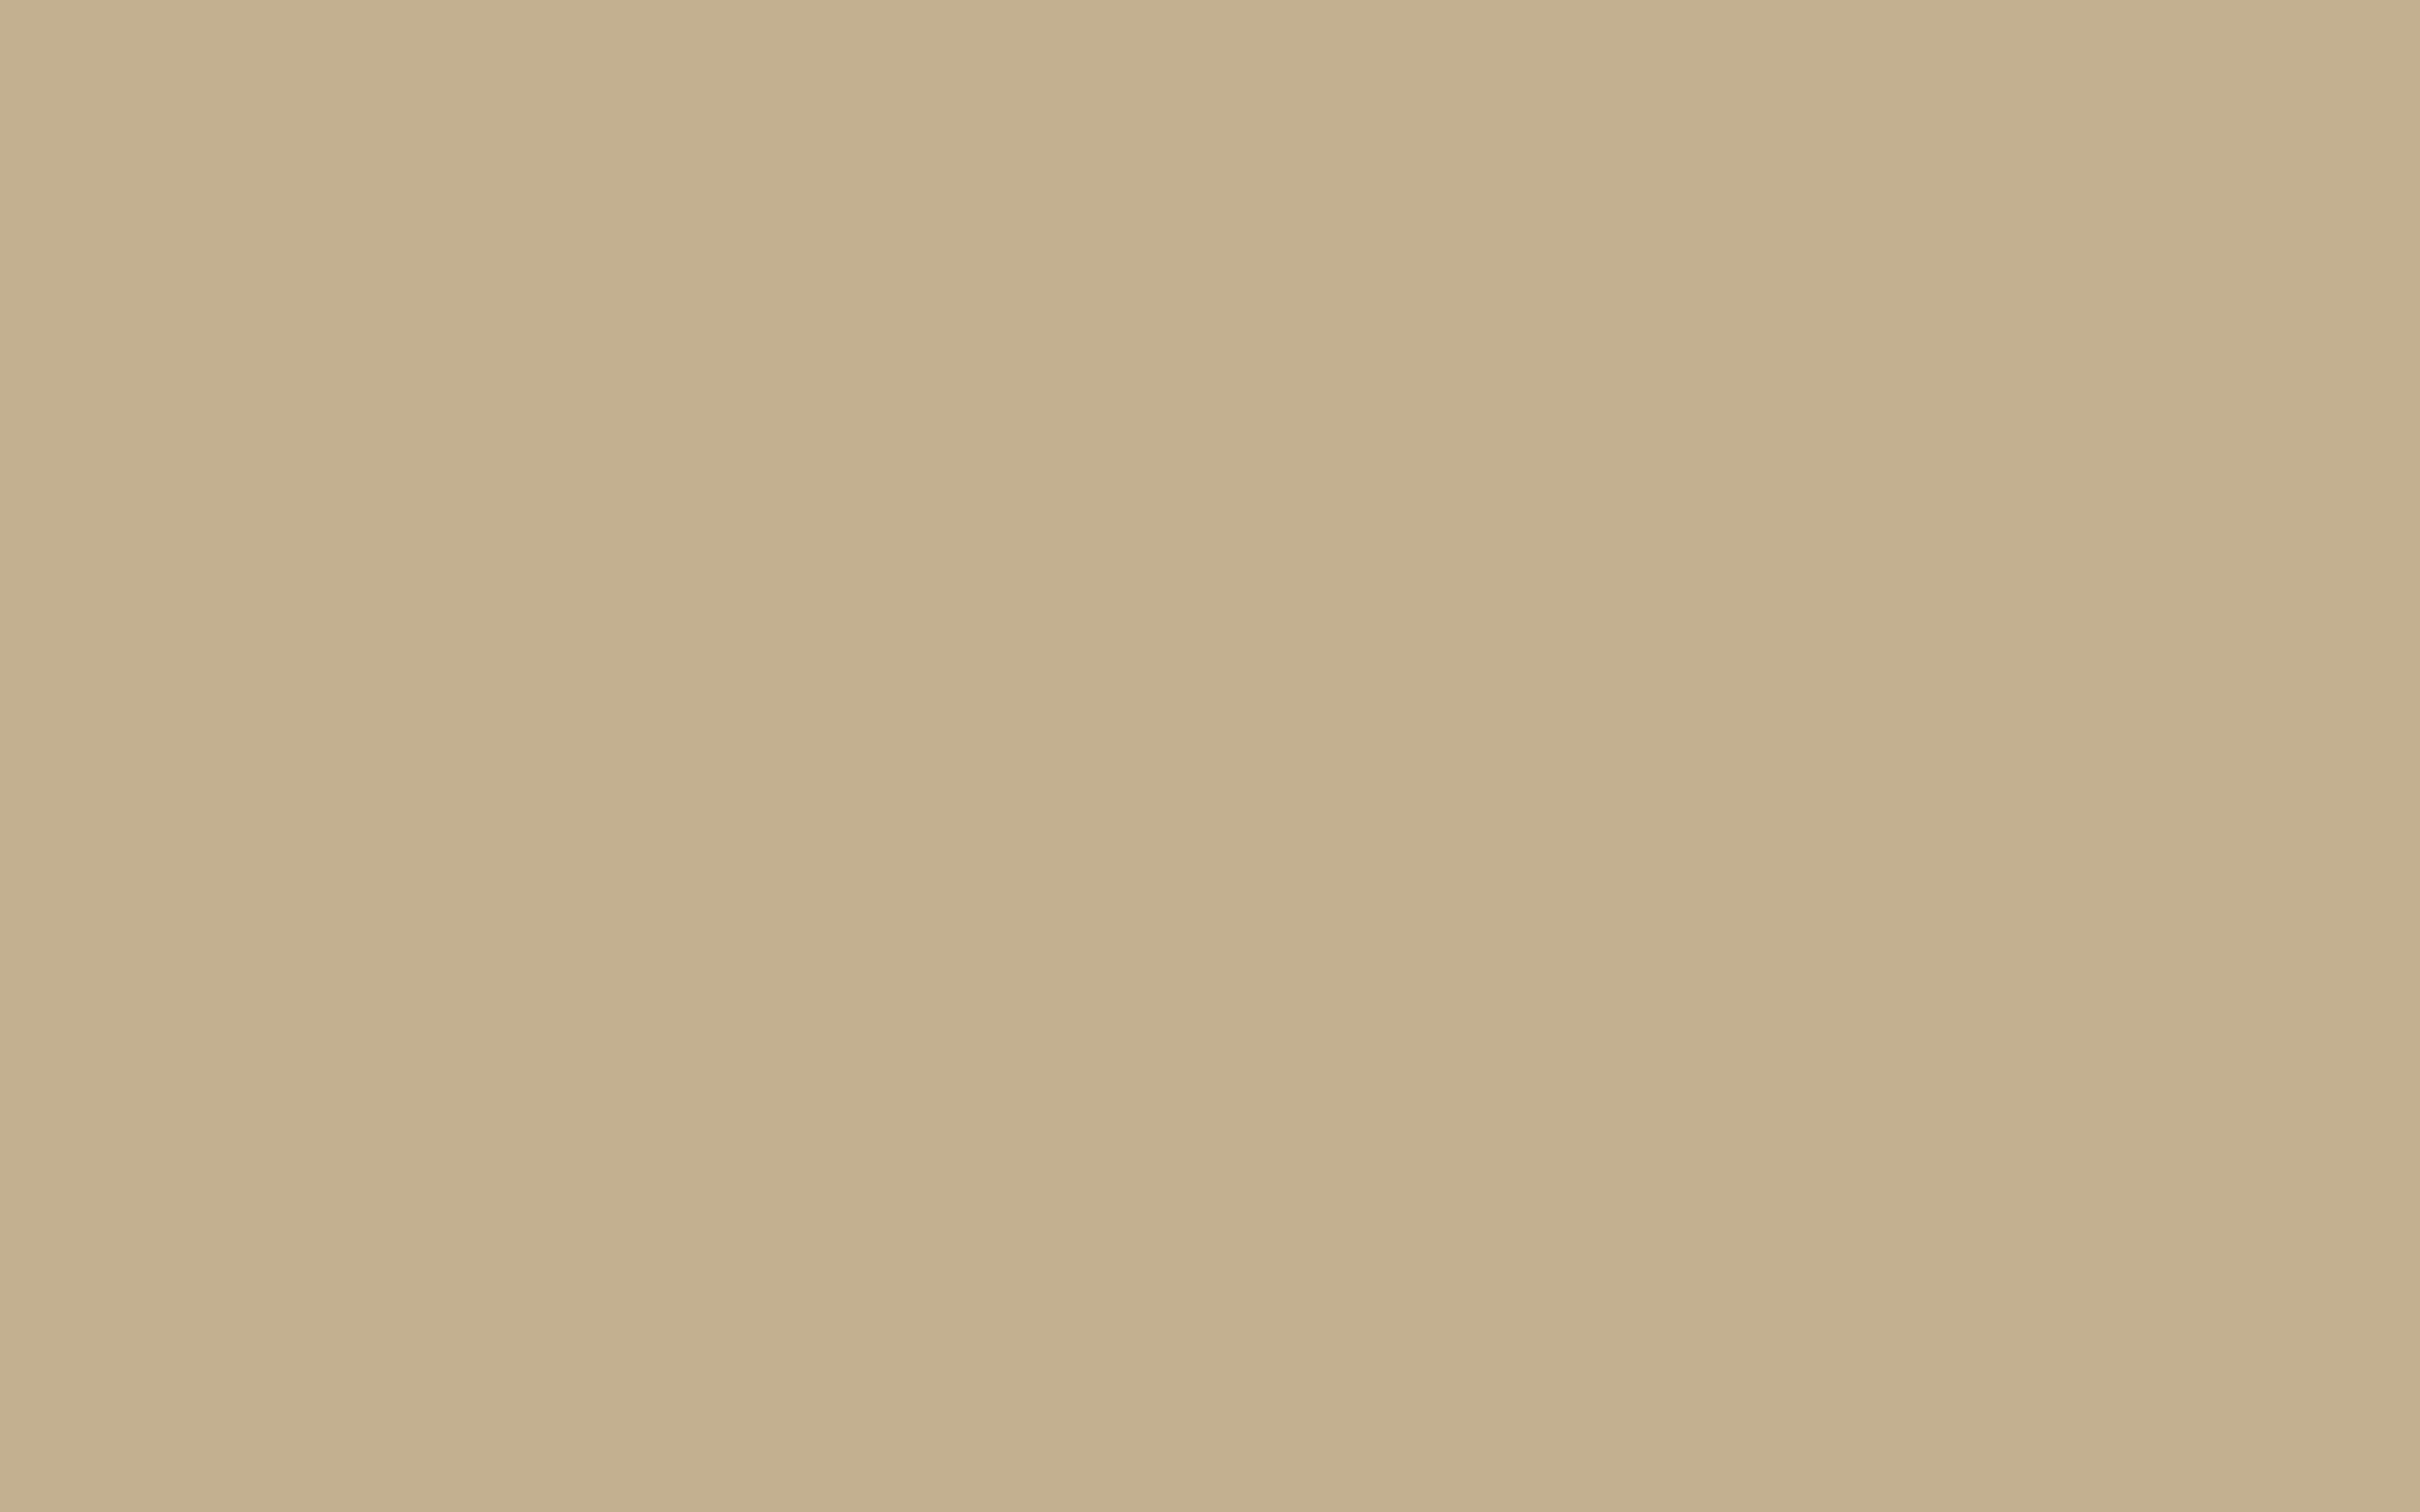 2560x1600 Khaki Web Solid Color Background